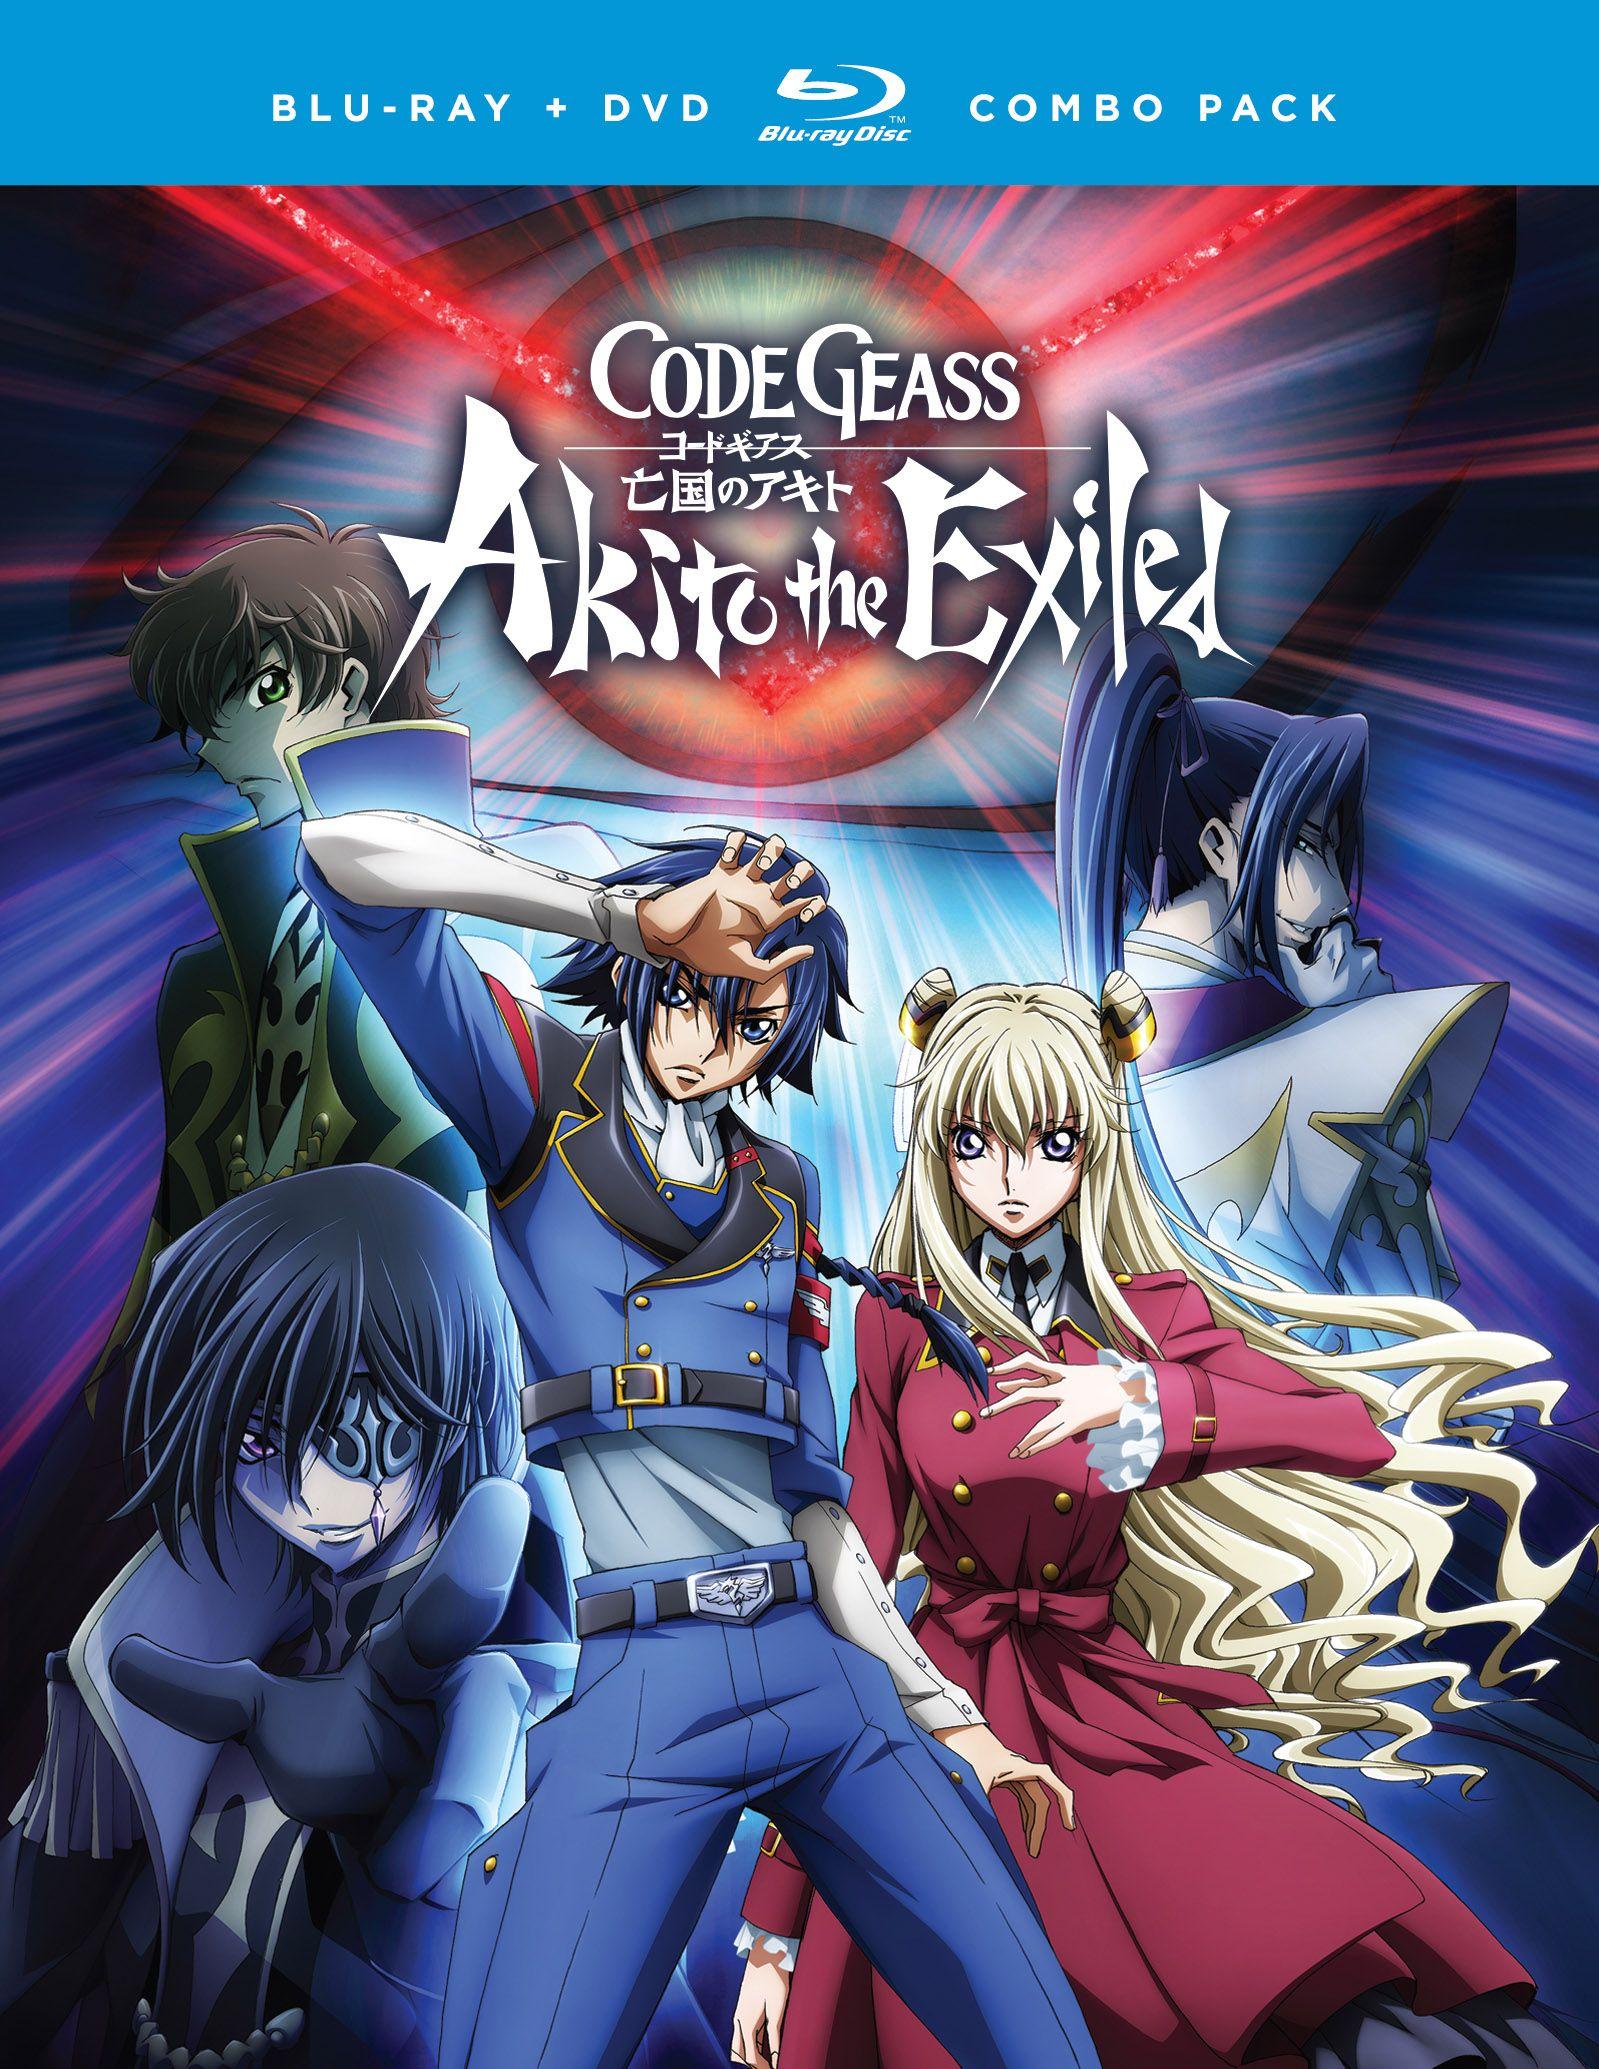 Code geass akito the exiled bluraydvd anime